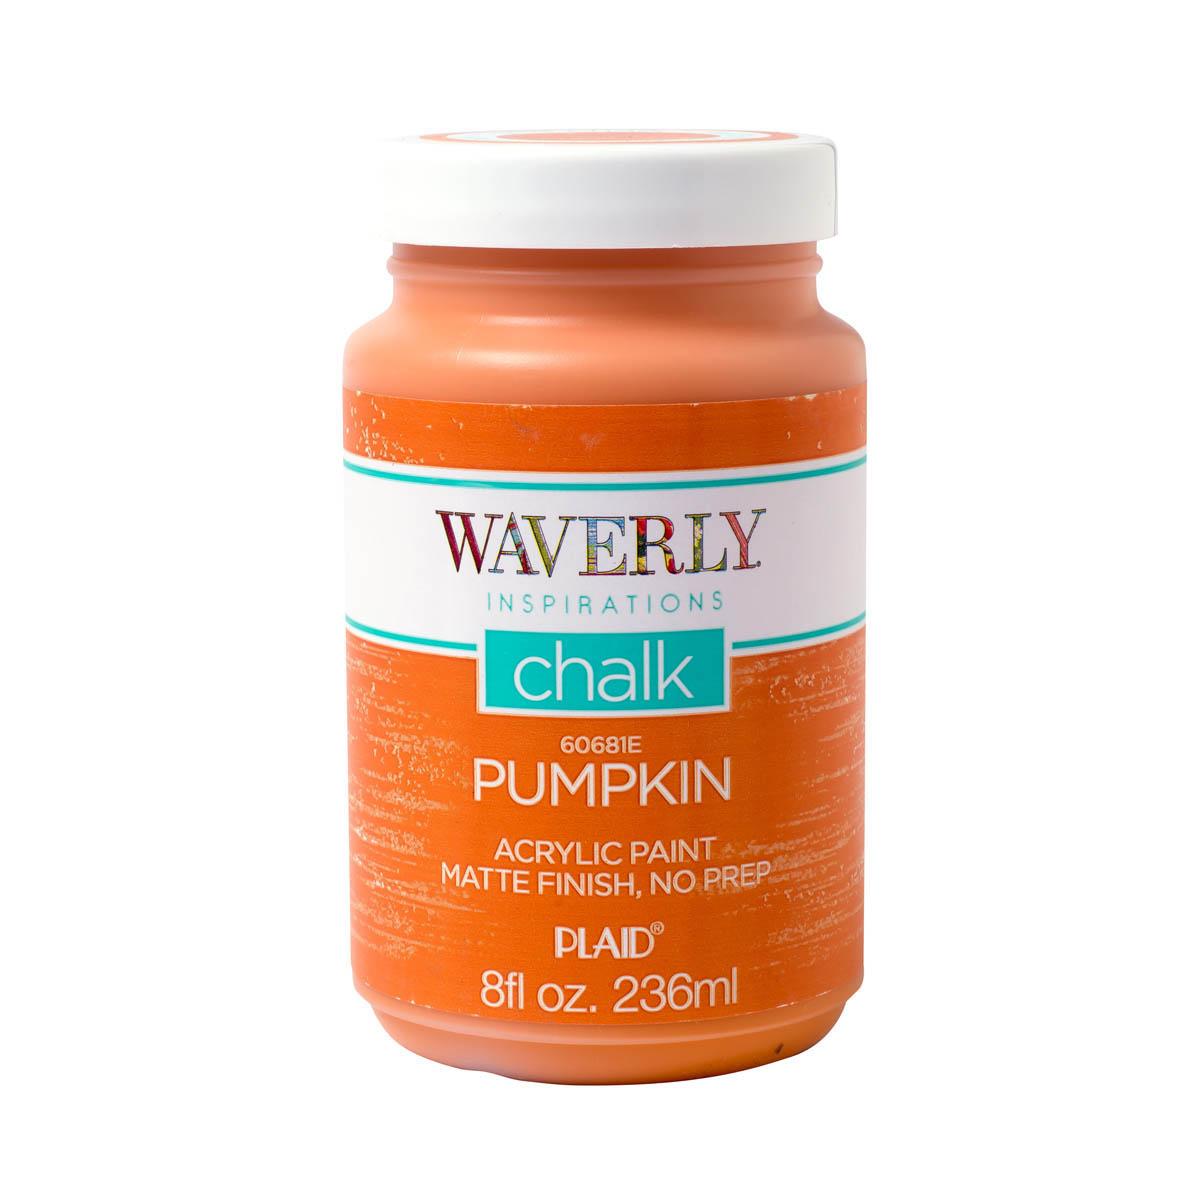 Waverly ® Inspirations Chalk Acrylic Paint - Pumpkin, 8 oz. - 60681E